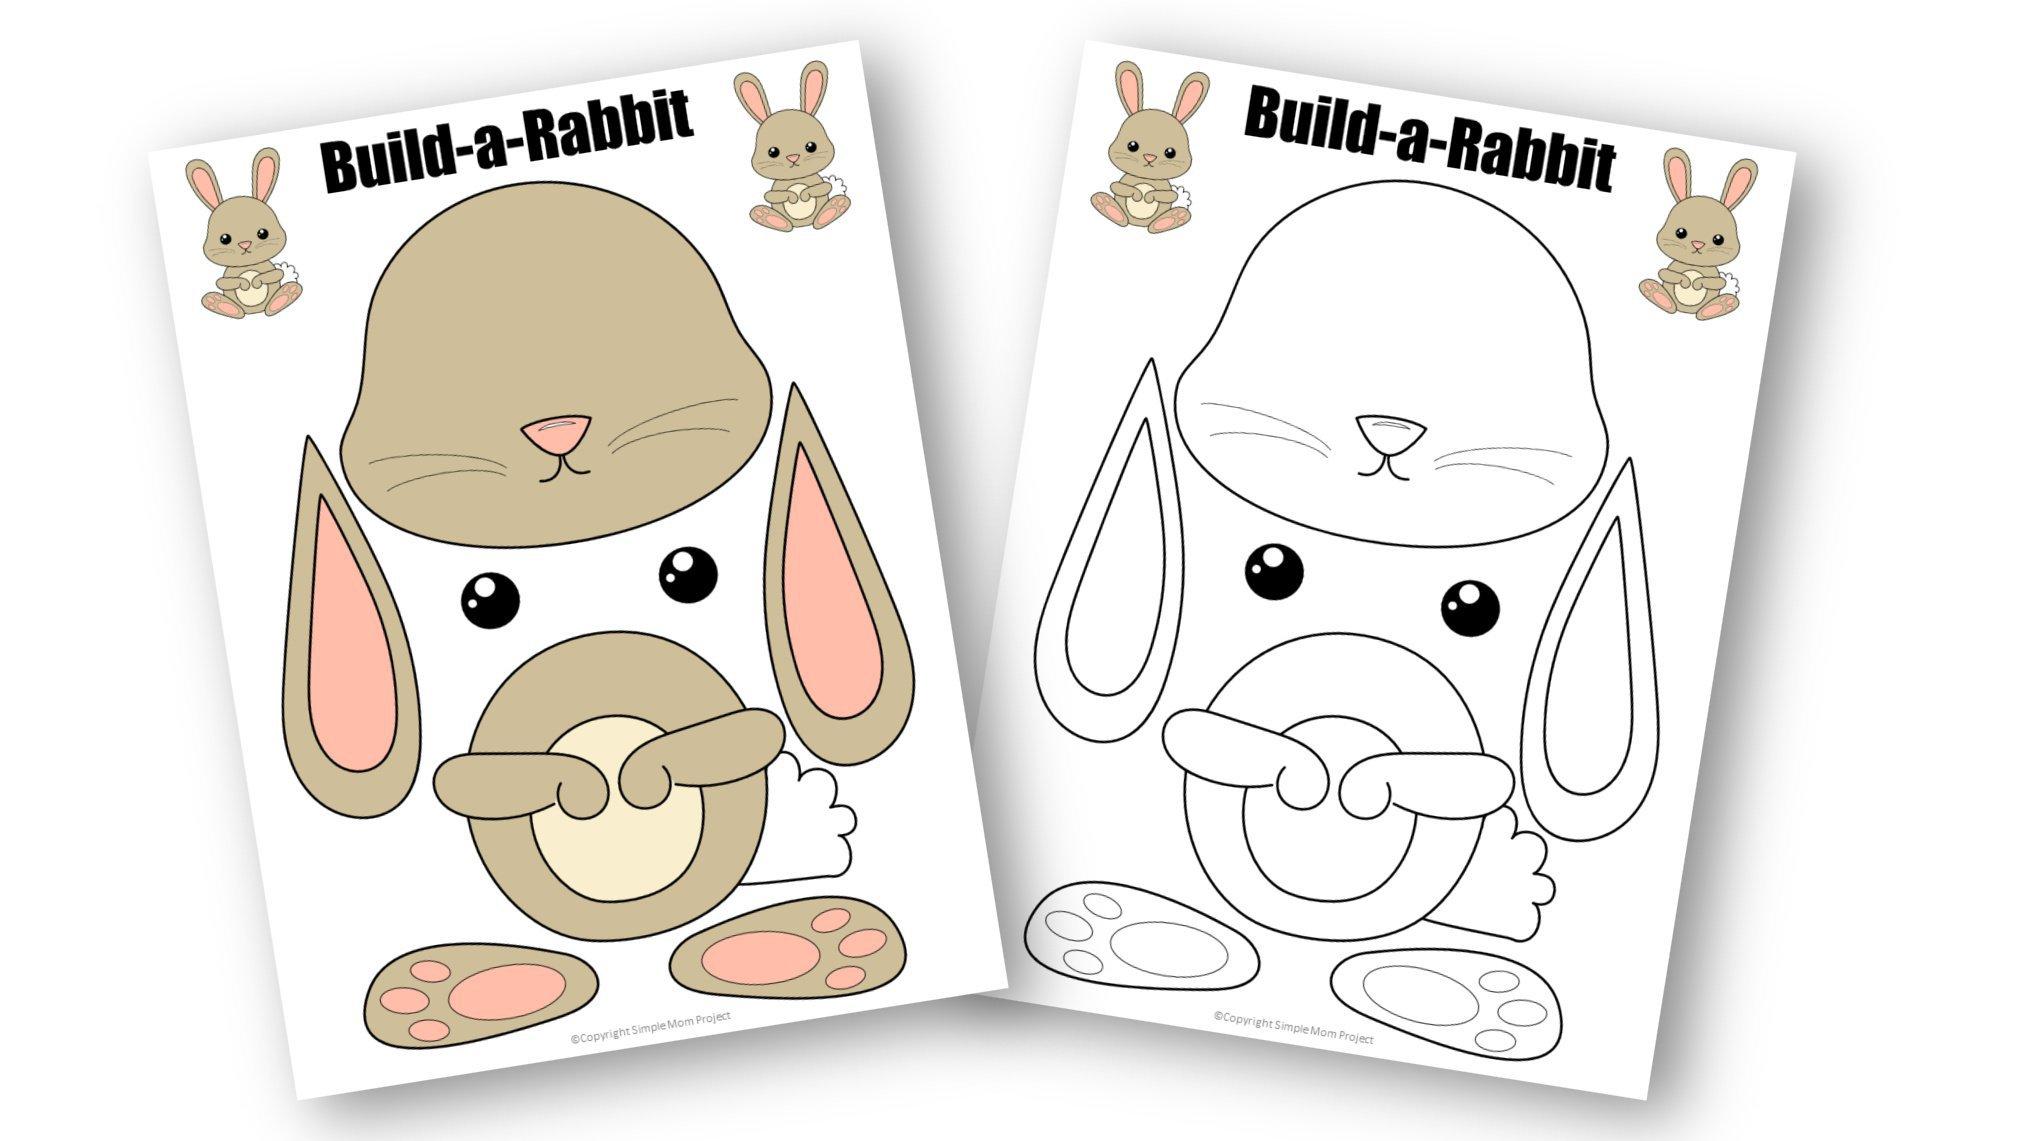 Free Printable Rabbit Craft Template for kids, preschoolers, toddlers and kindergartners